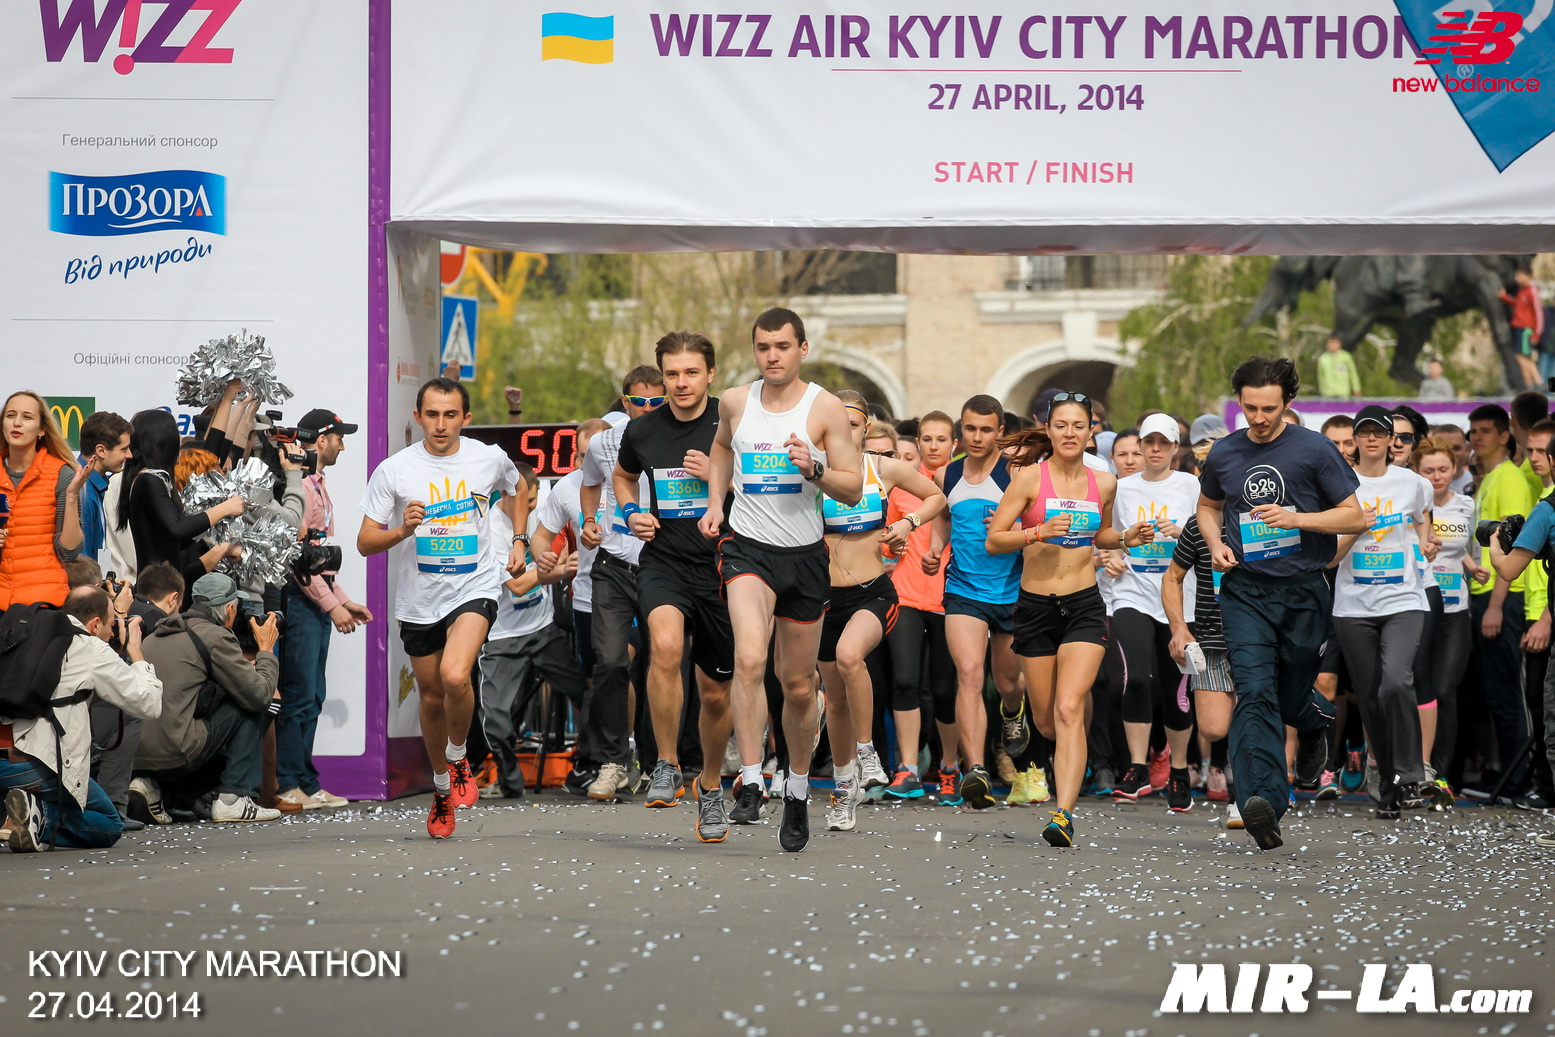 WIZZ AIR KYIV CITY MARATHON 2014 - 27.04.2014